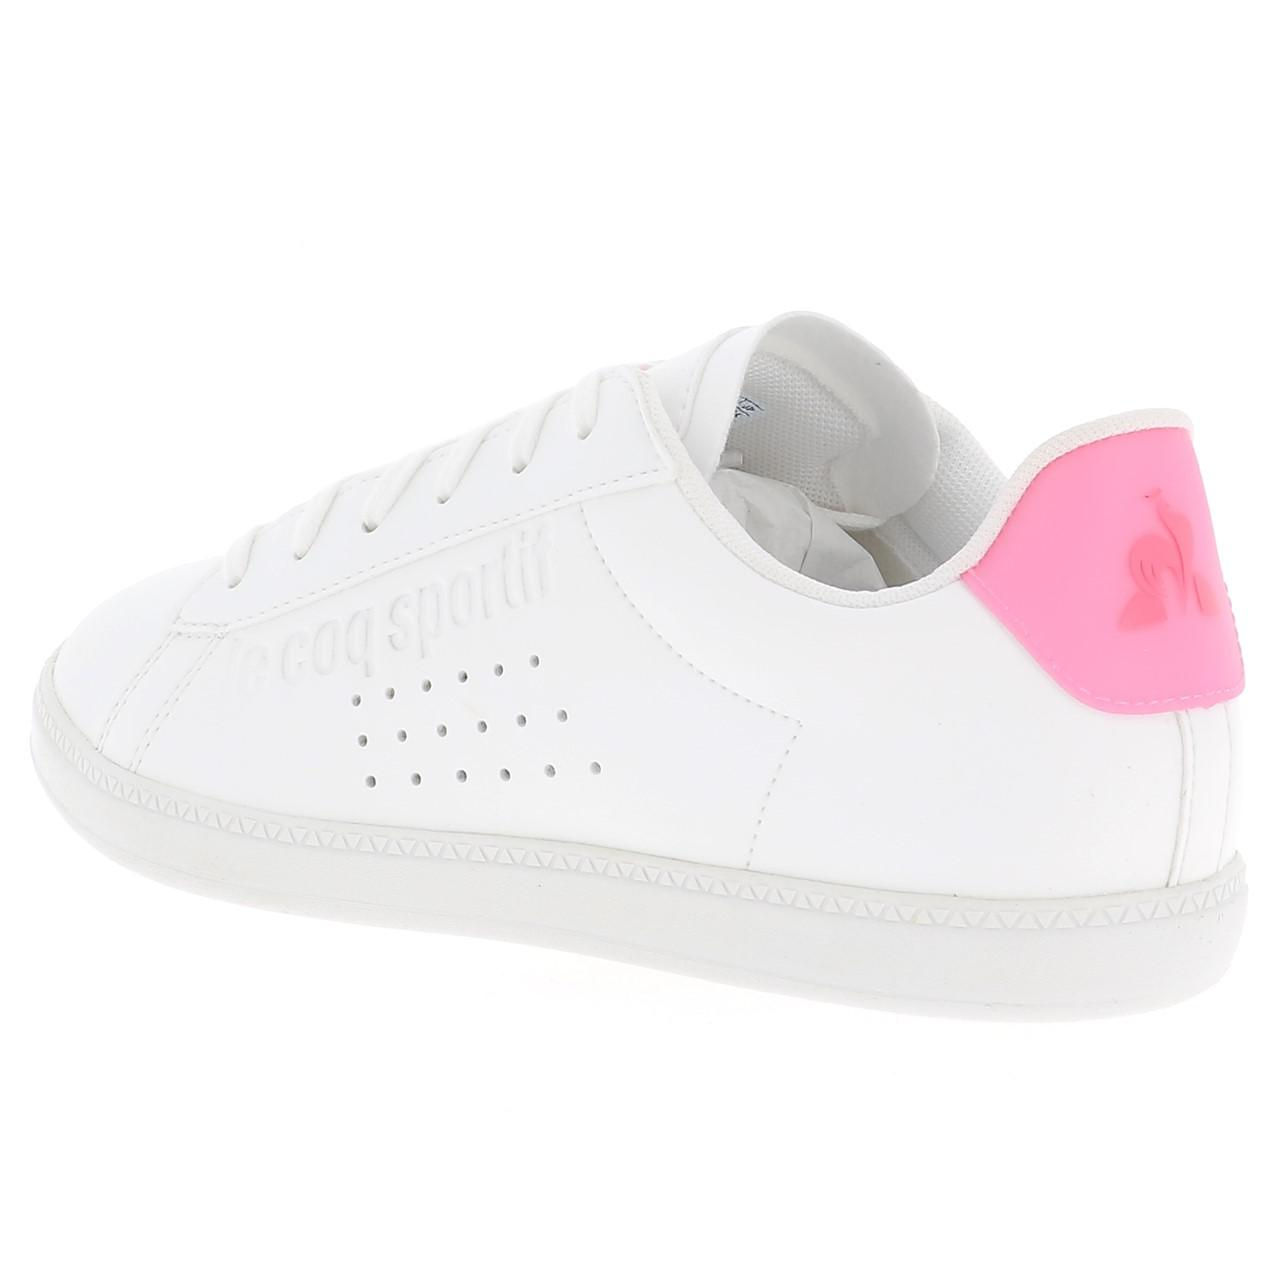 Schuhe-Niedrig-Leder-oder-Faux-Le-Coq-Sportif-Courtset-Maedchen-Blc-Weiss-47681 Indexbild 3